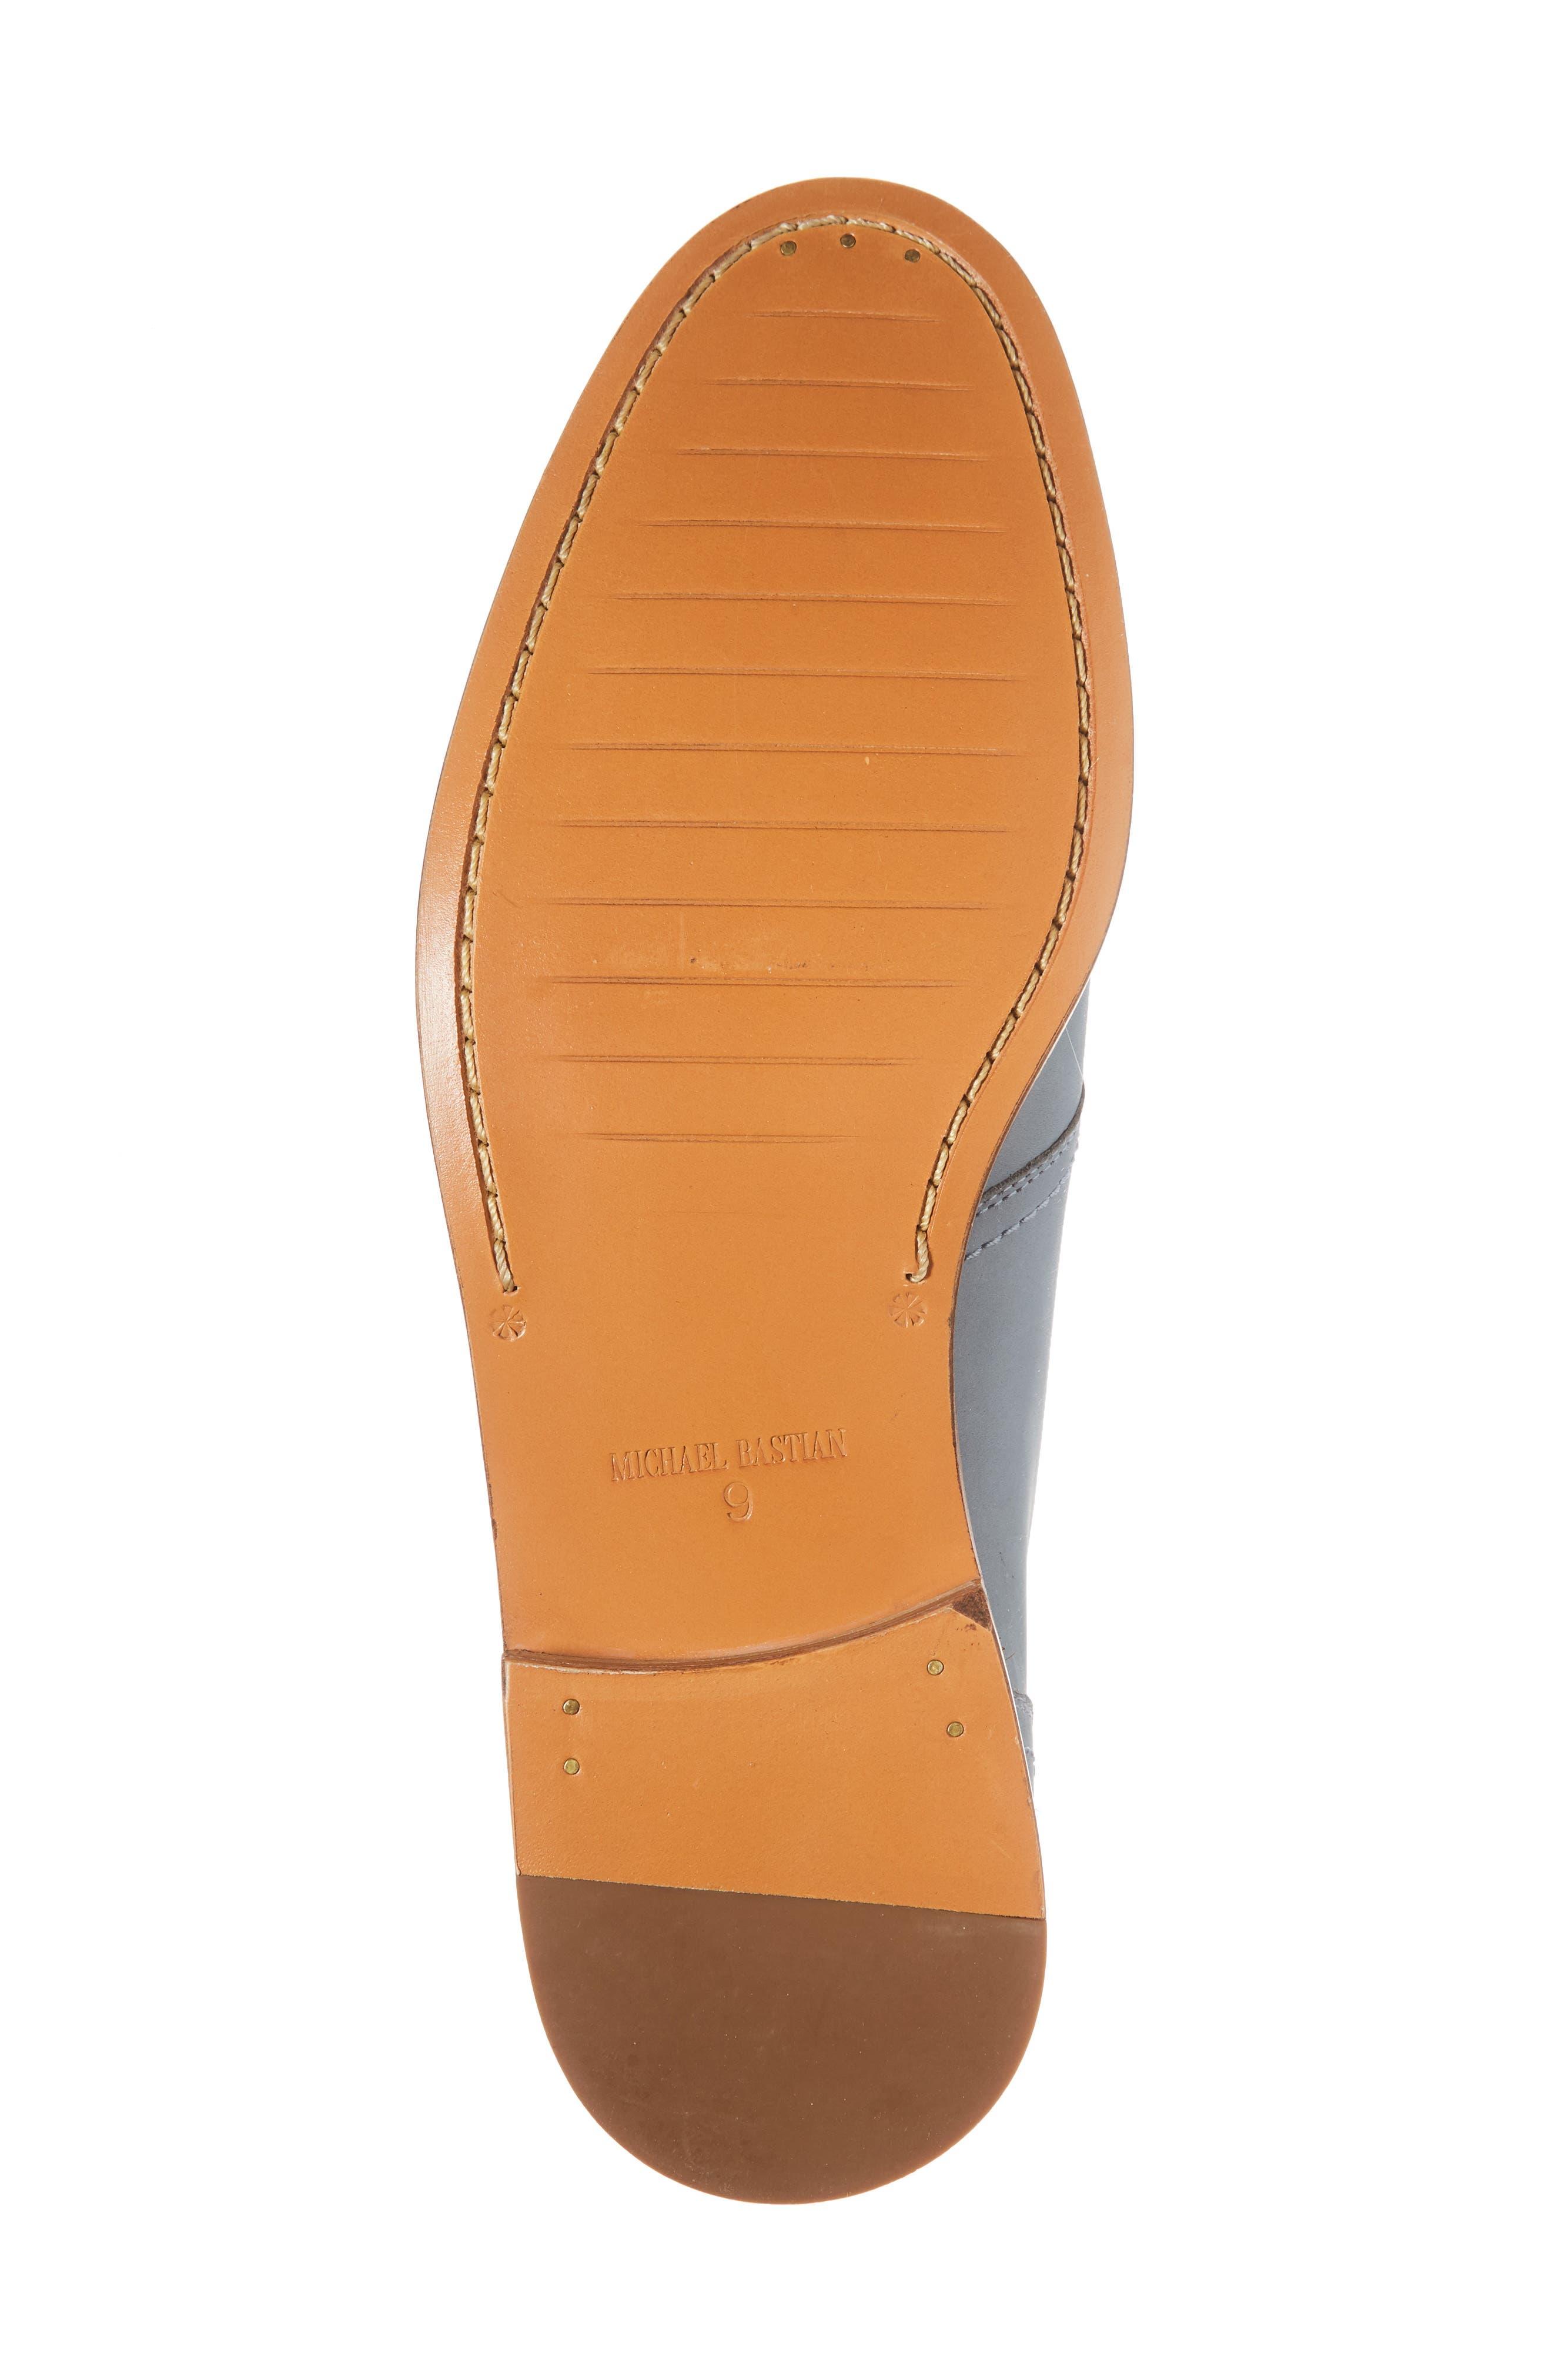 Caan Plain Toe Derby,                             Alternate thumbnail 6, color,                             Flint Stone Leather